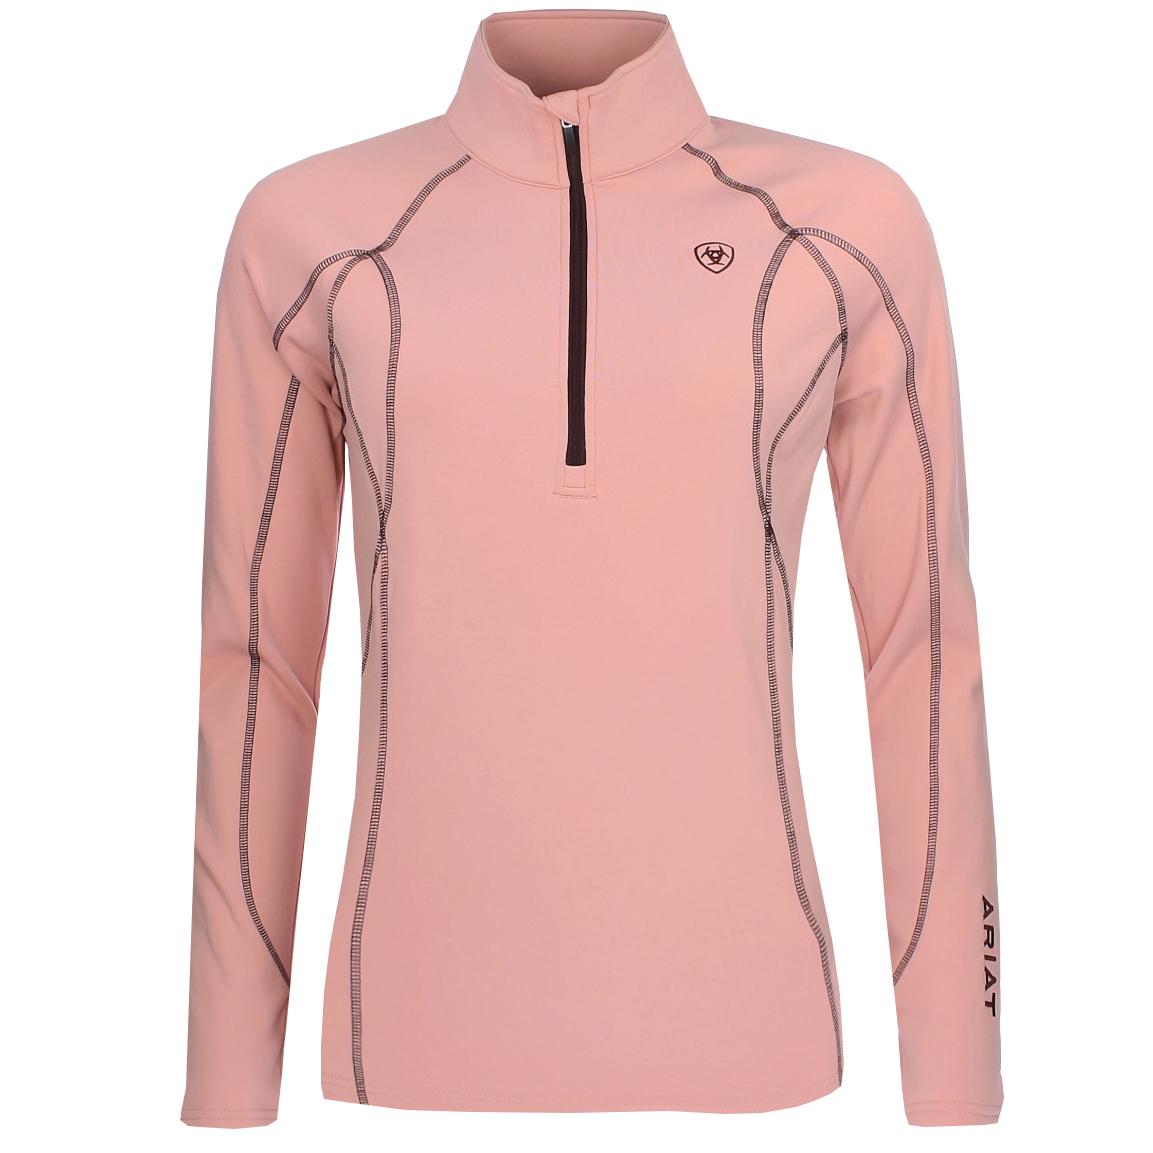 Ariat Conquest nj20 techshirt roze maat:l